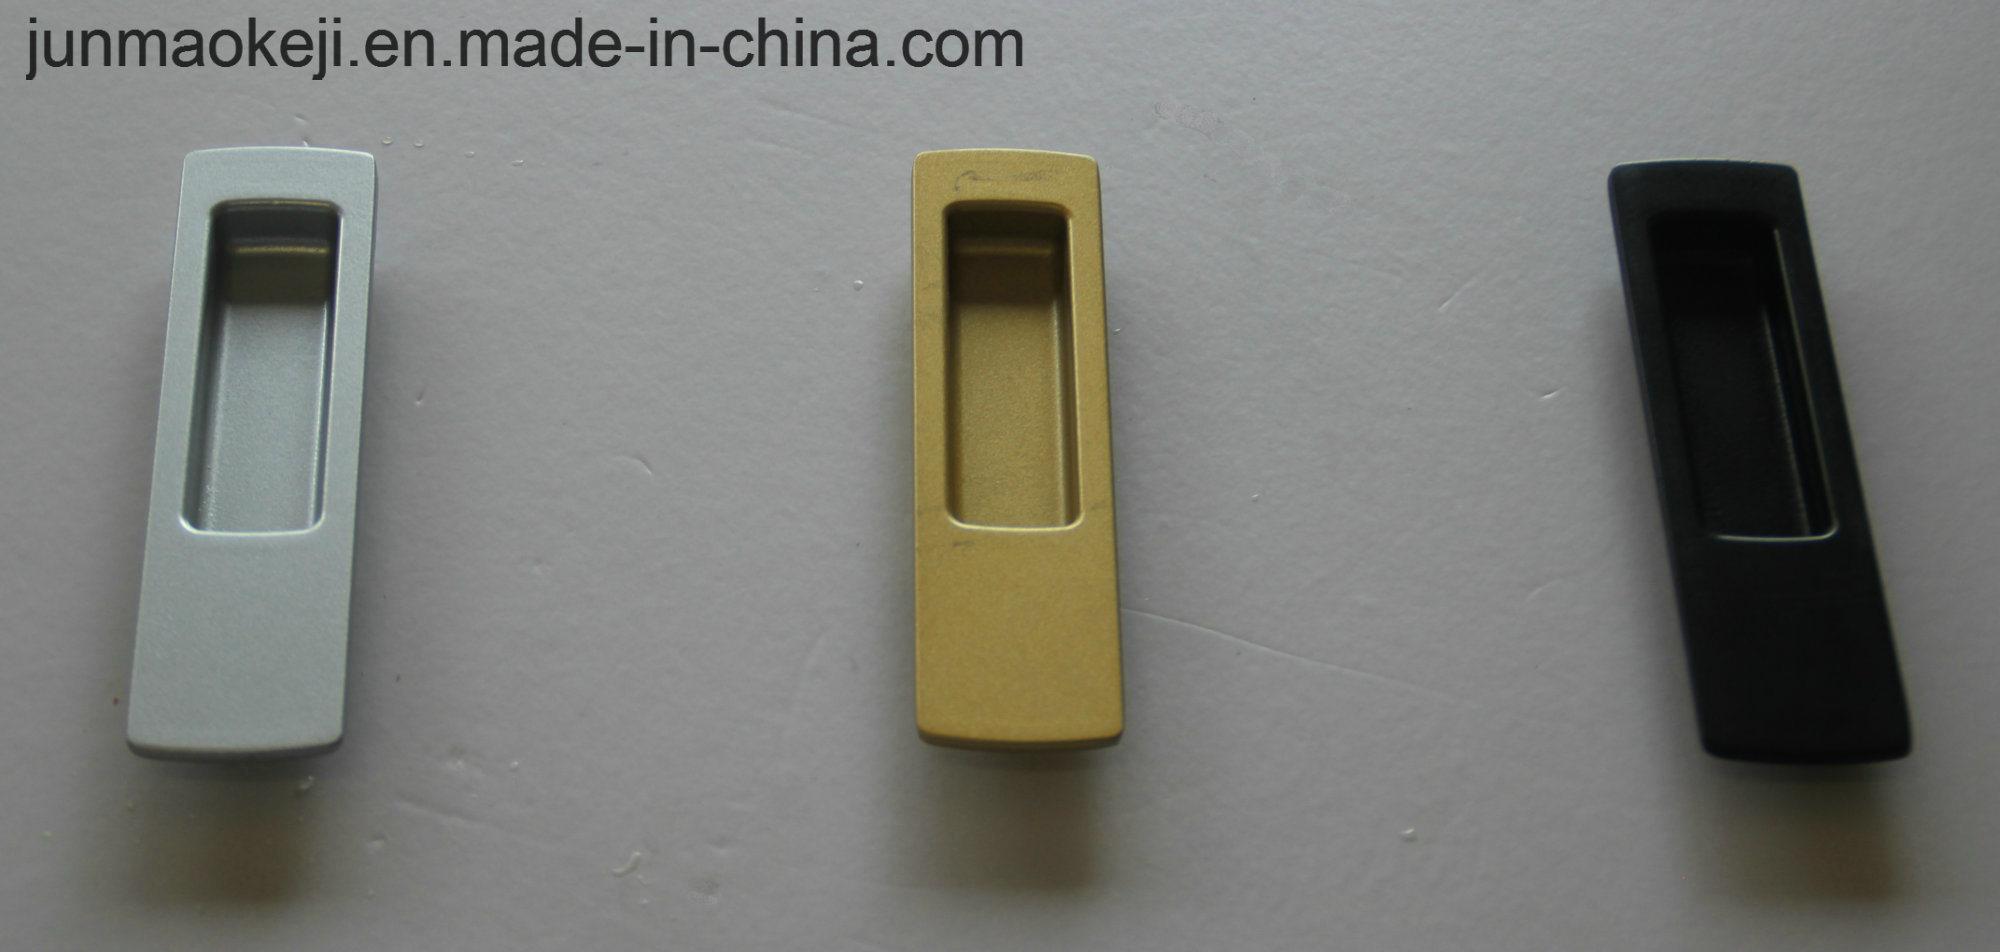 Aluminum Concealed Furniture or Cabinet Handle, Door Handle